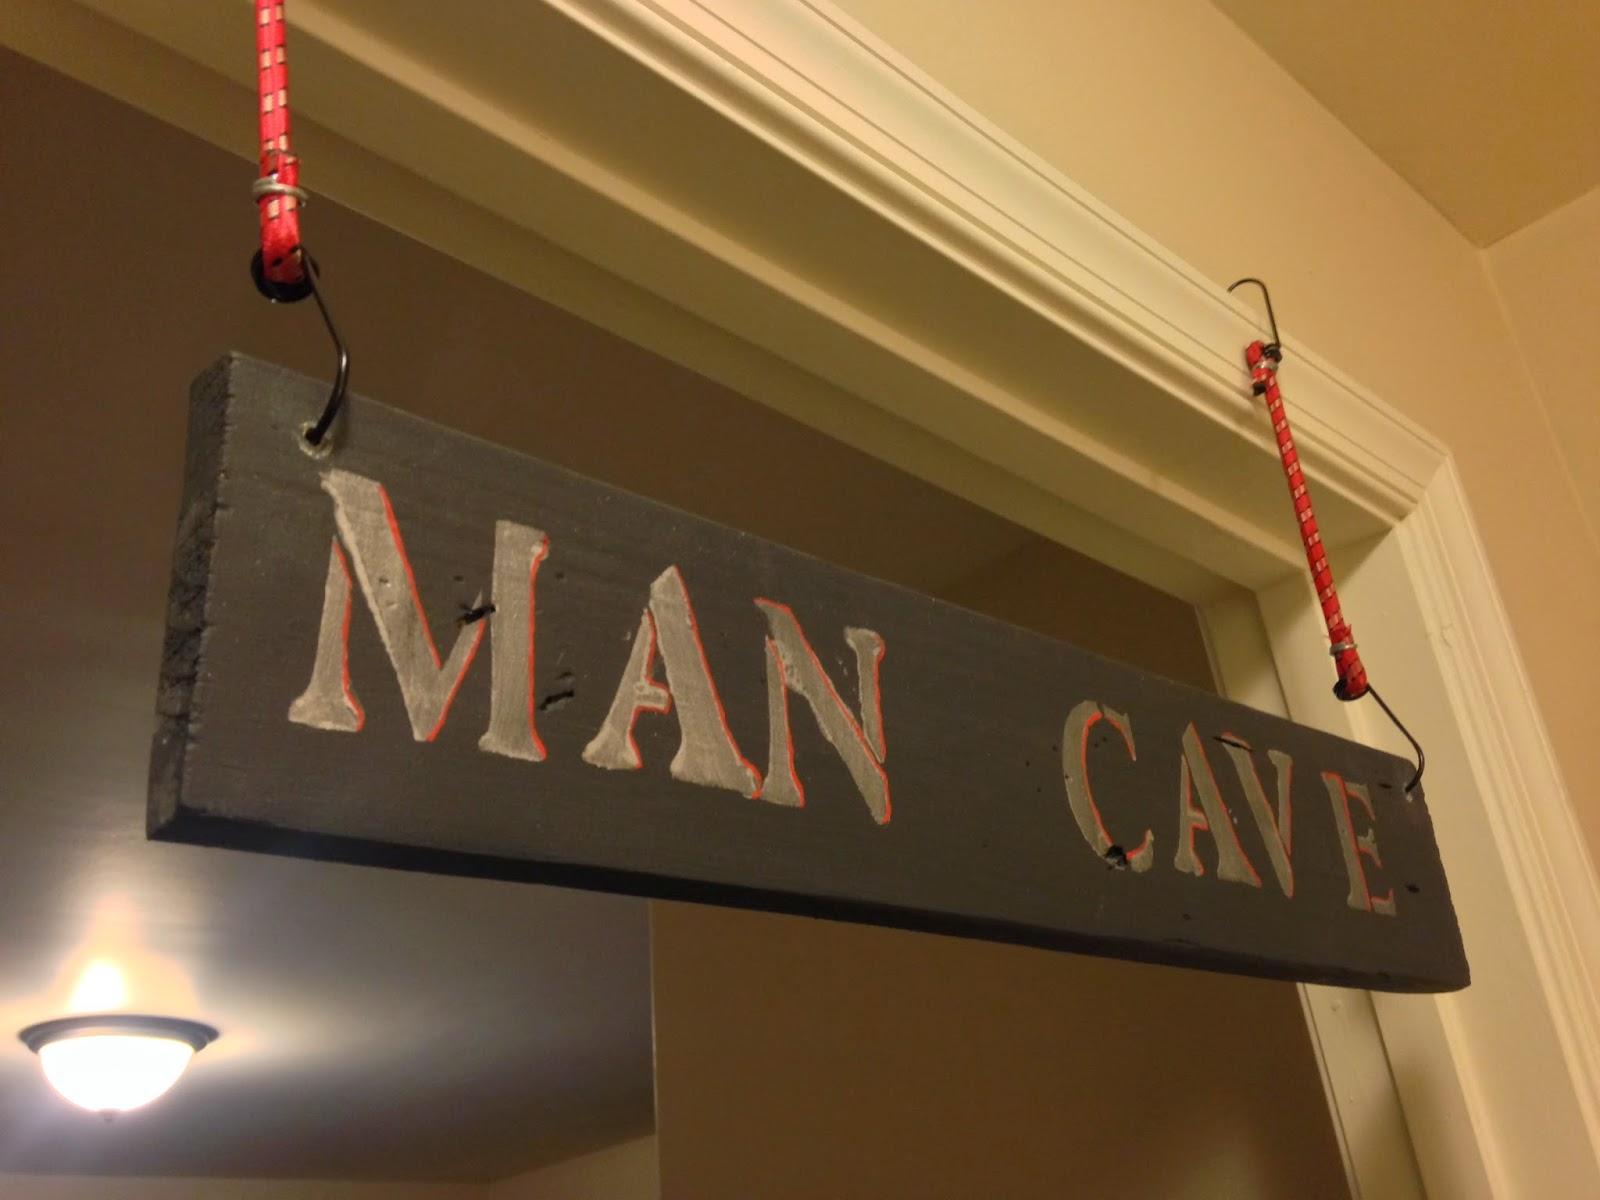 Michigan Man Cave Signs : Man cave house ideas. movie bookngo.biz